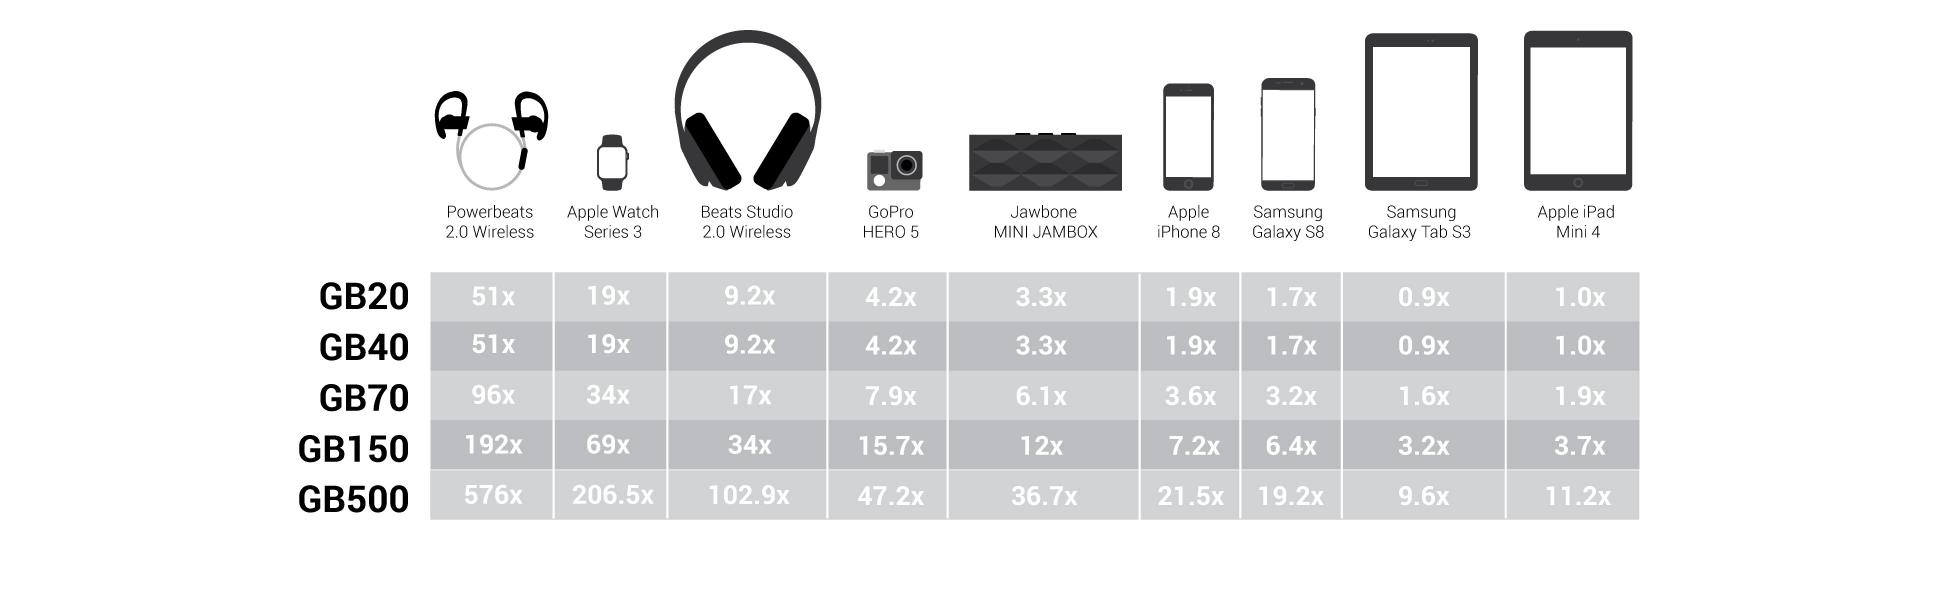 Genius-Boost-Lithium-Battery-Car-Jump-Starter-Pack-Multi-Function-USB-Power-Bank-3.6.18.jpg